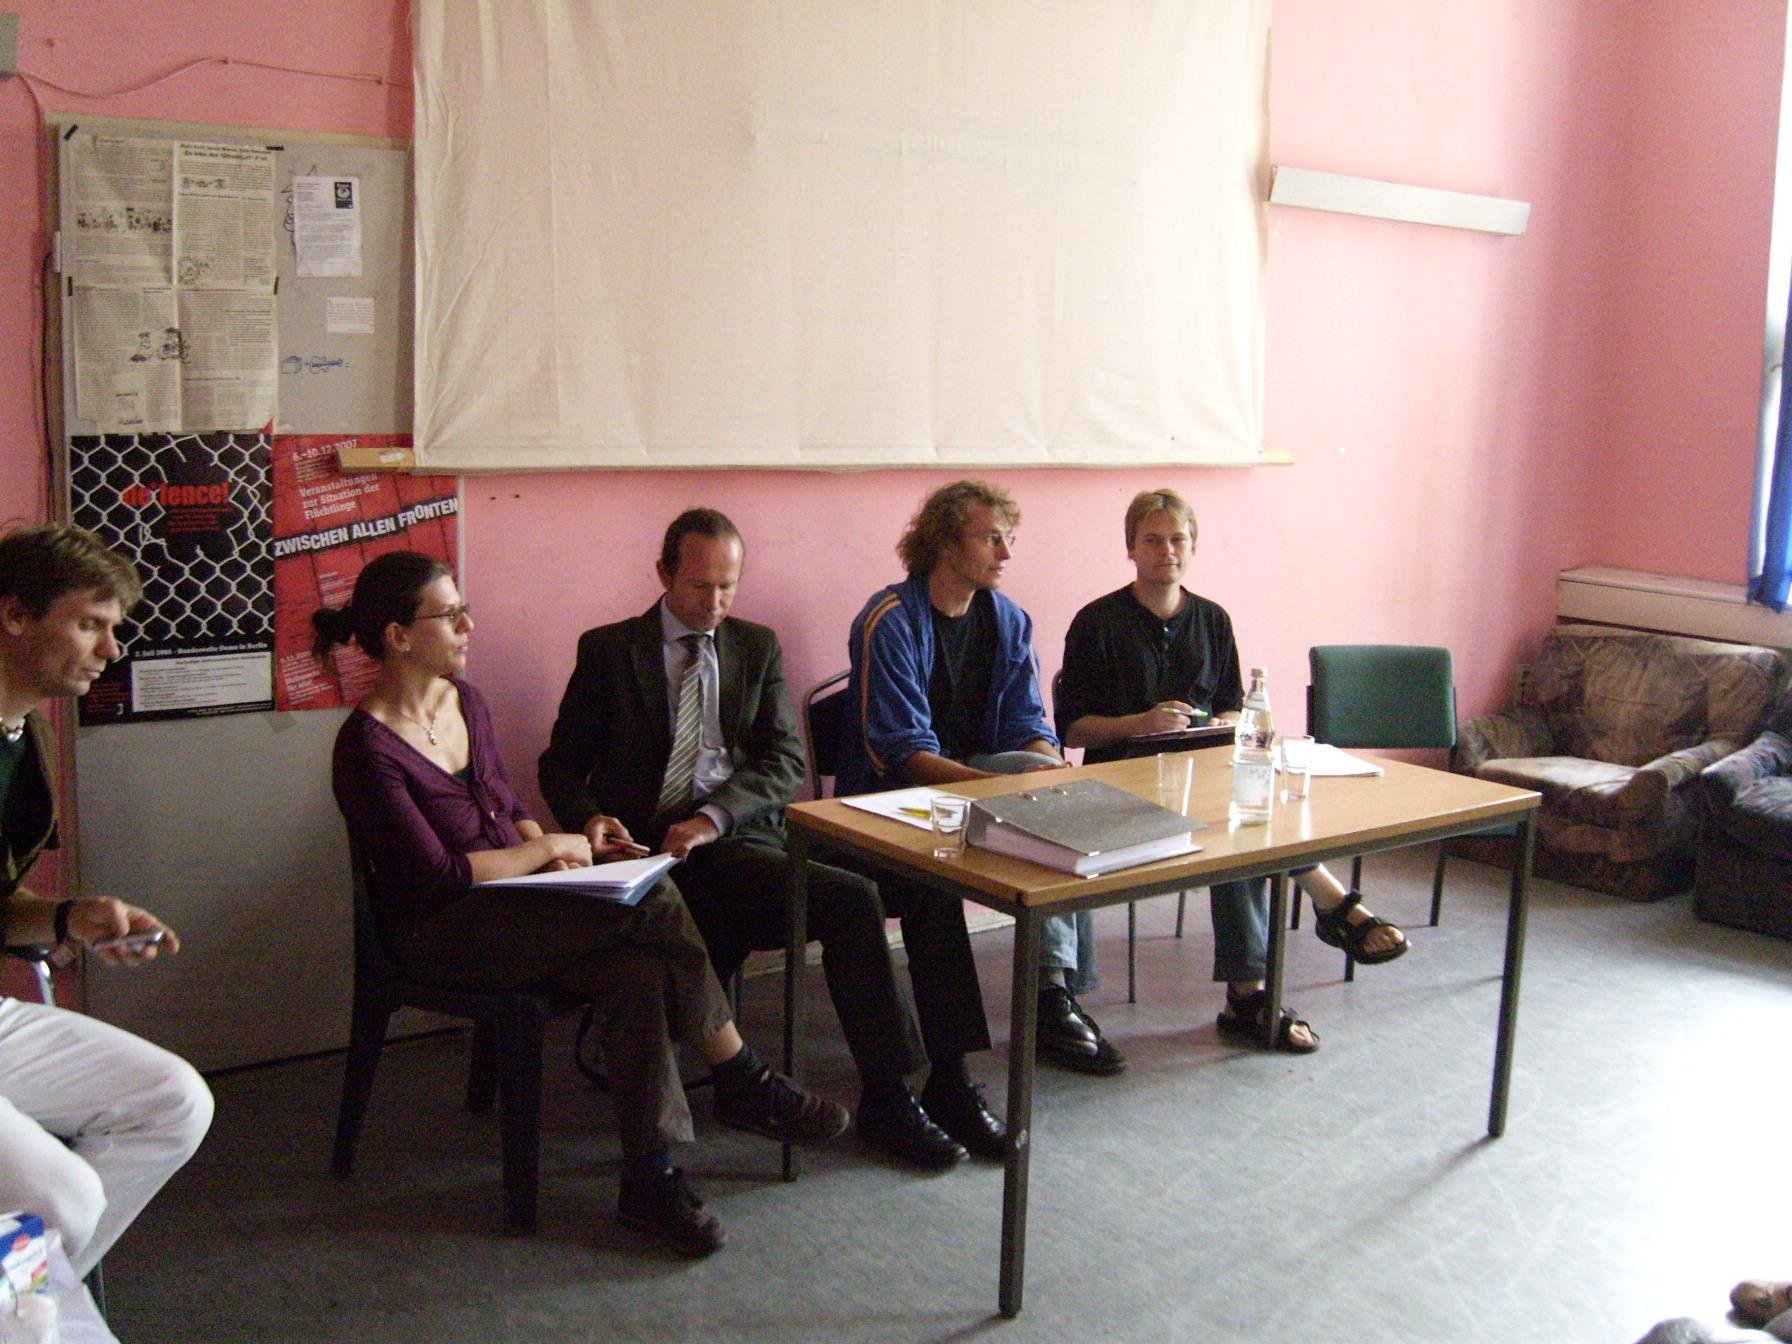 pressekonferenz-im-rosa-raum